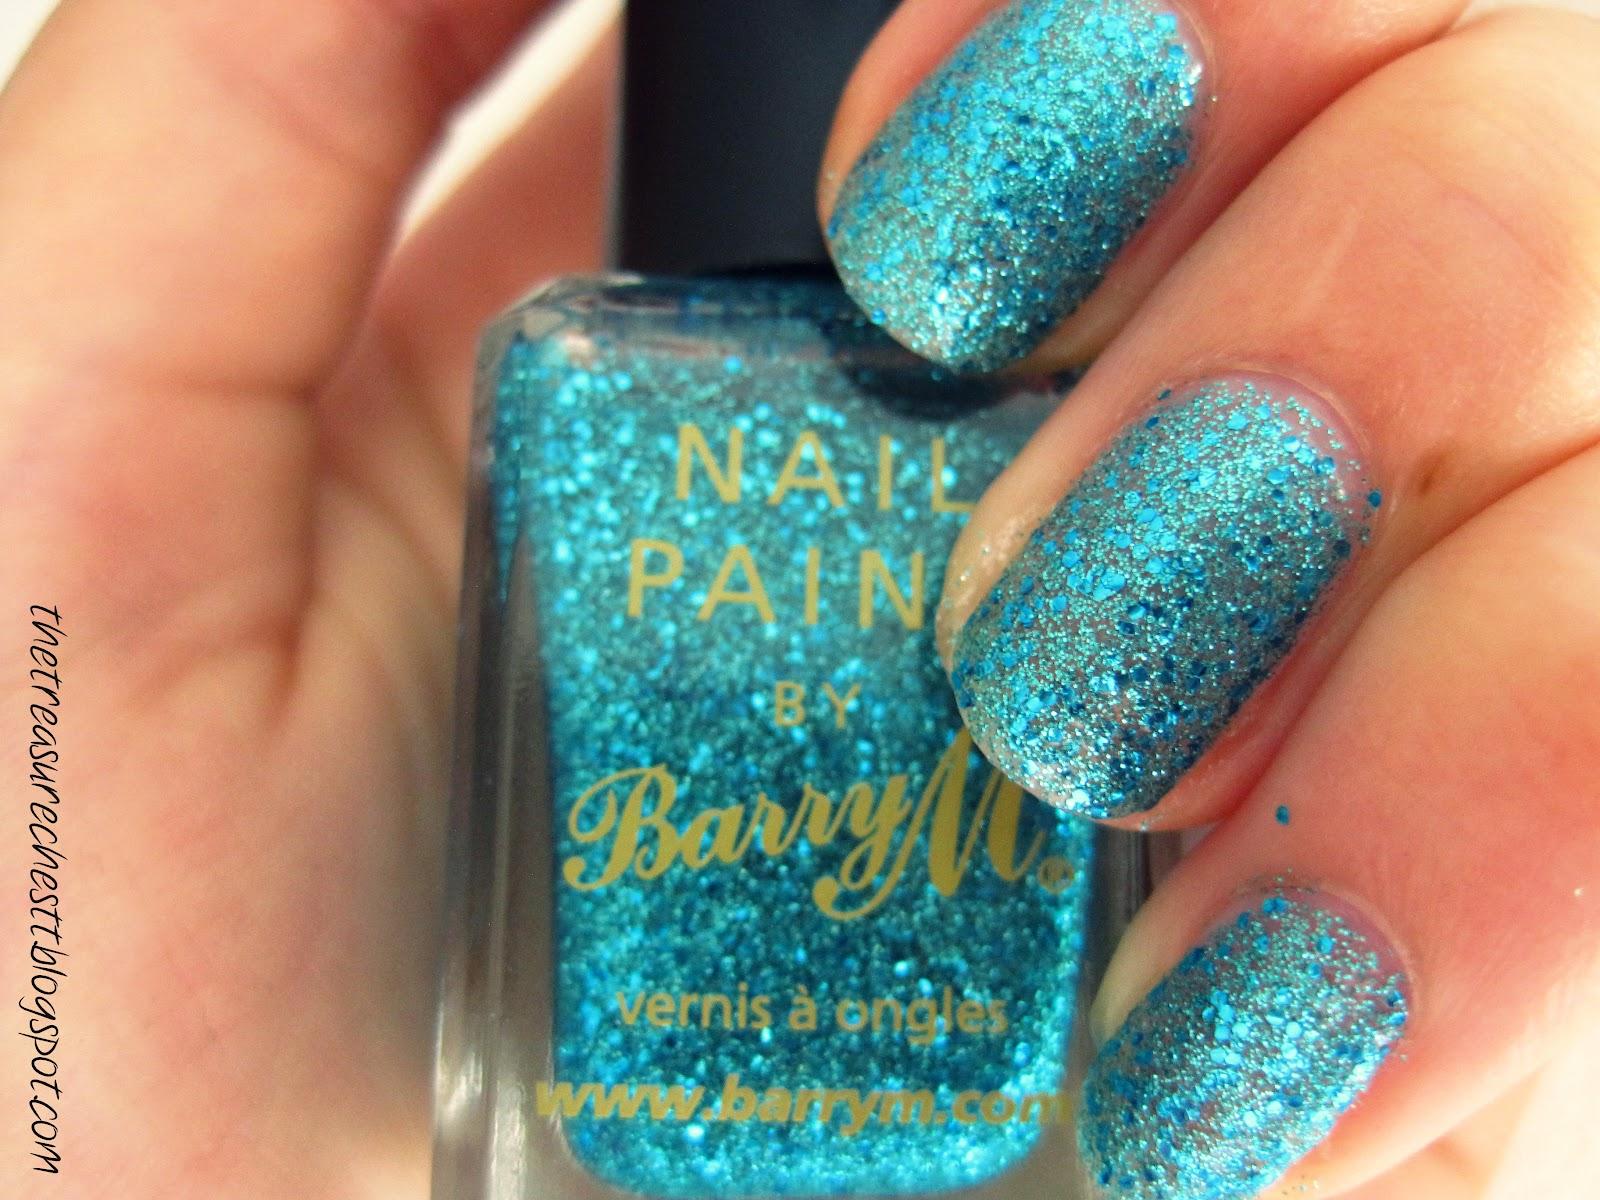 Monday Blues Barrym Aqua Glitter